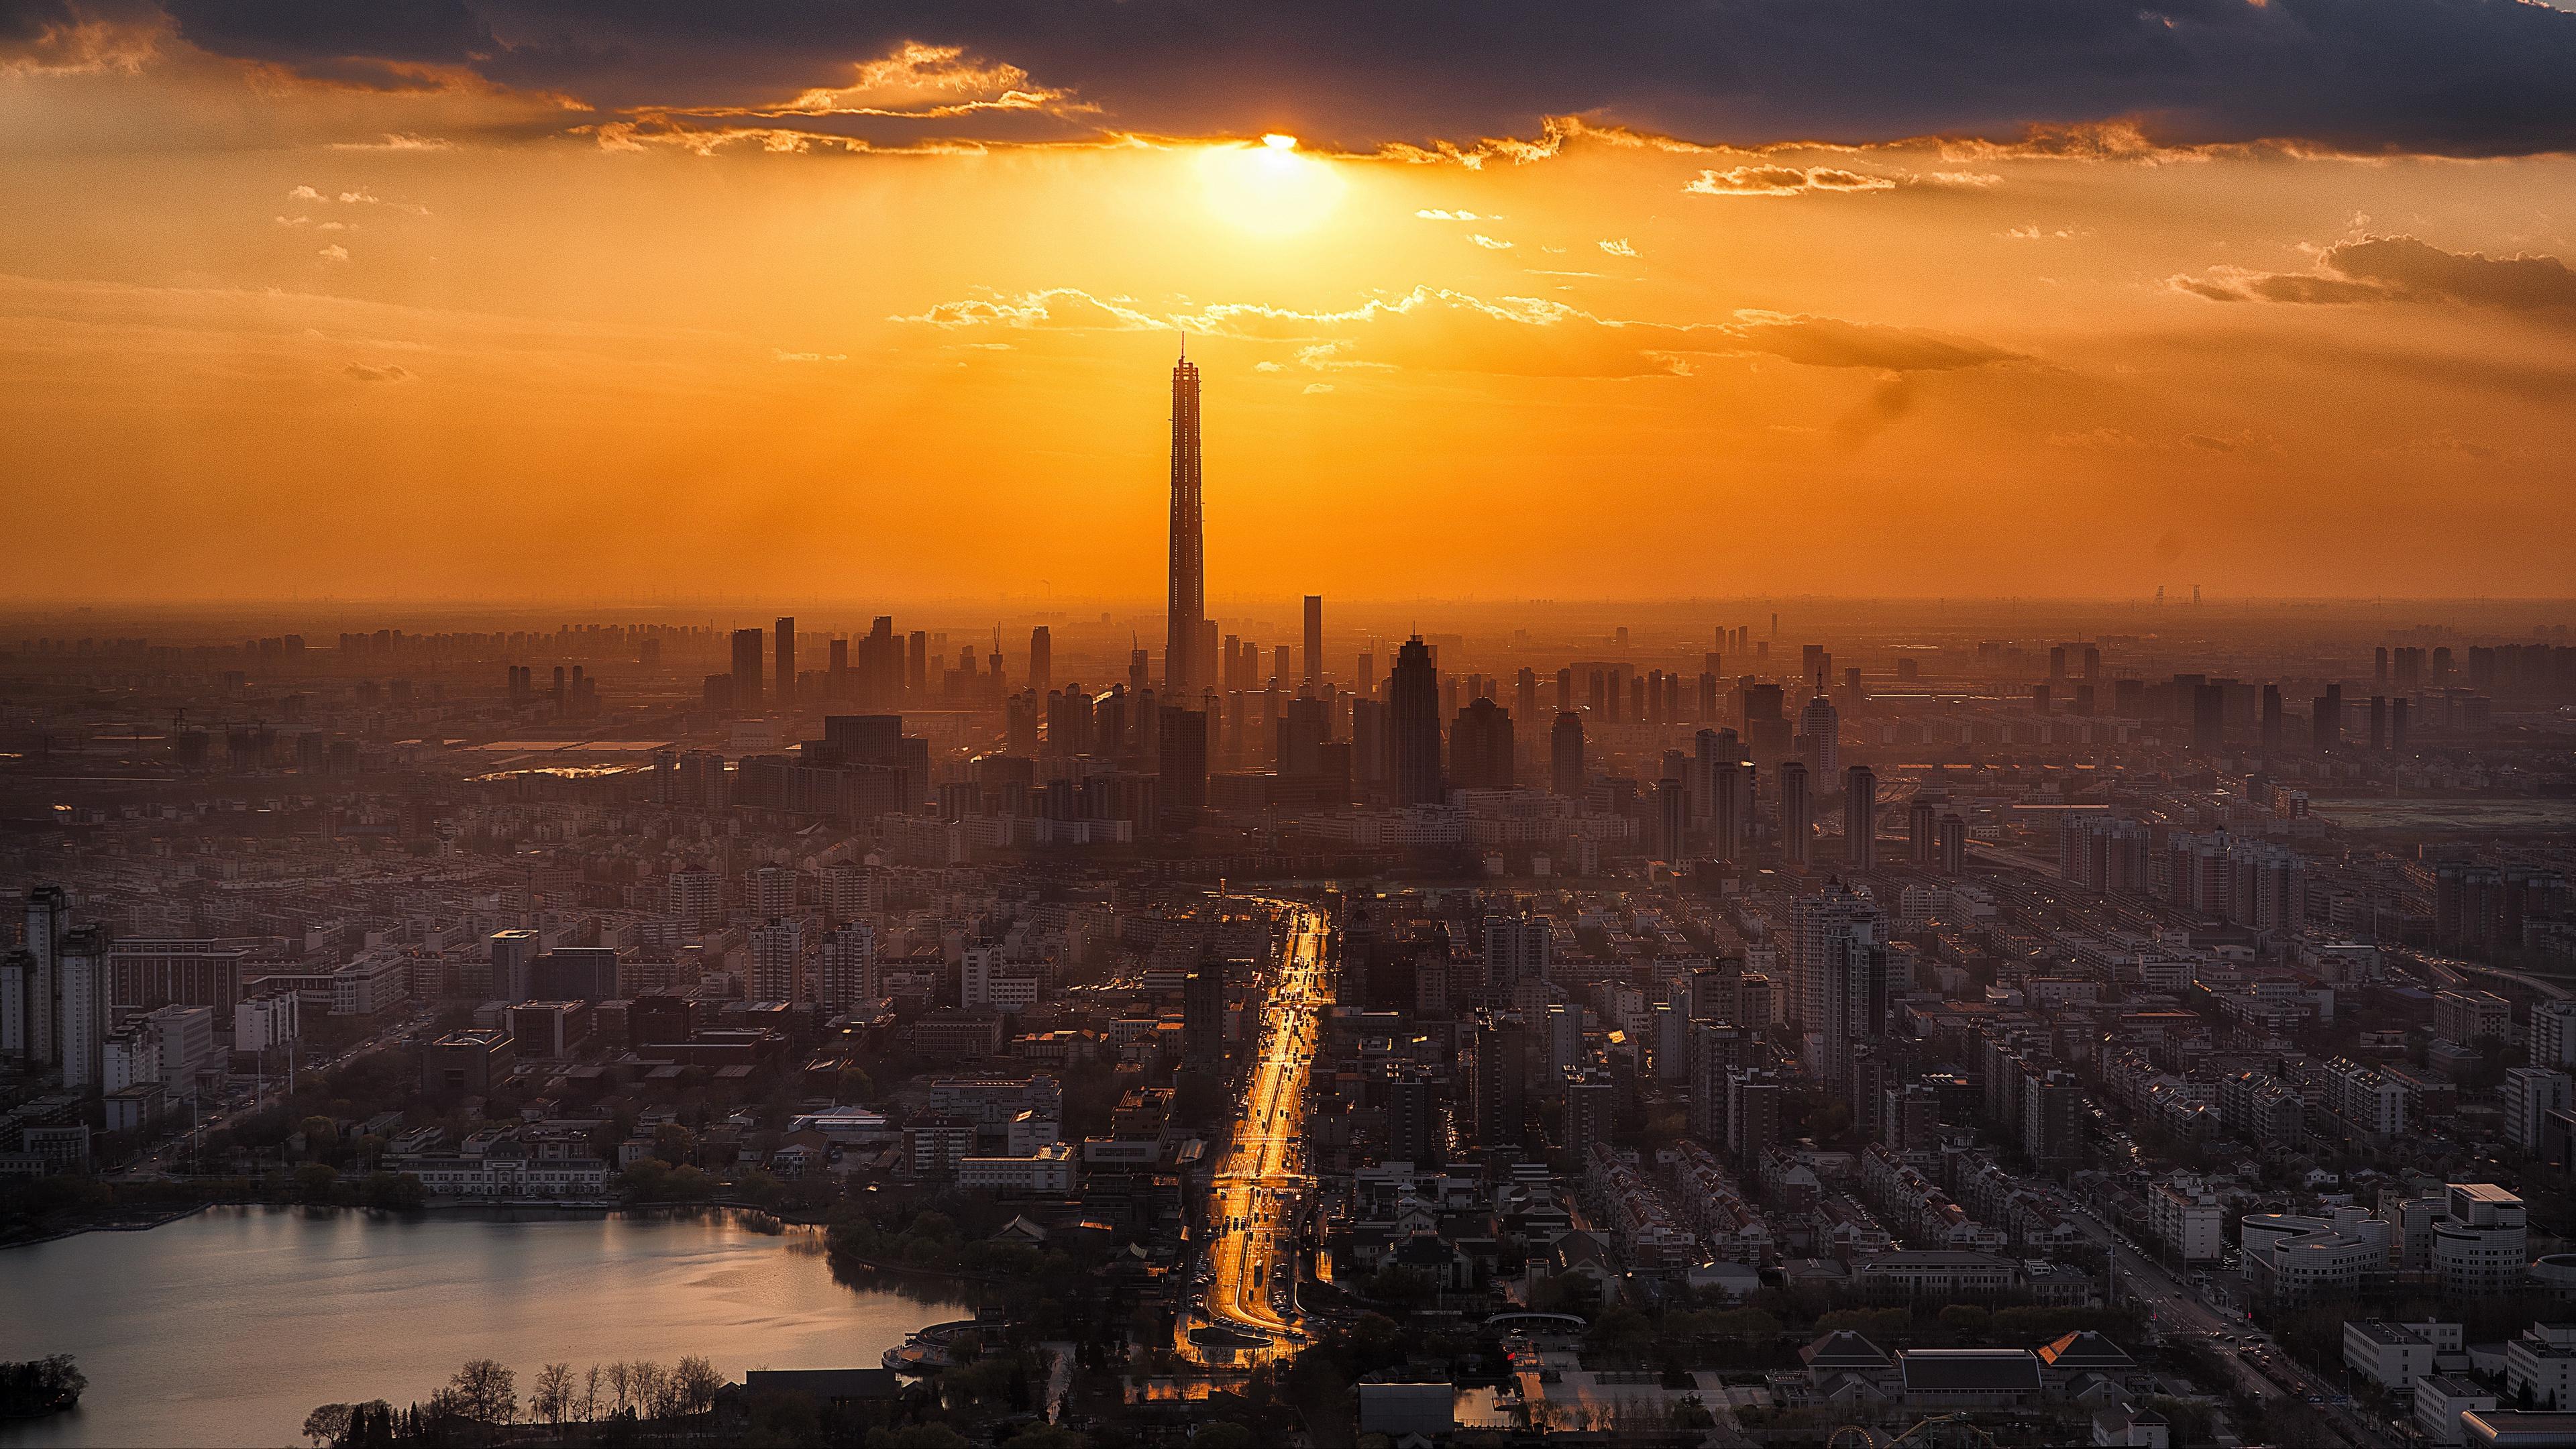 city sunset skyscrapers tianjin china 4k 1538066619 - city, sunset, skyscrapers, tianjin, china 4k - sunset, Skyscrapers, City